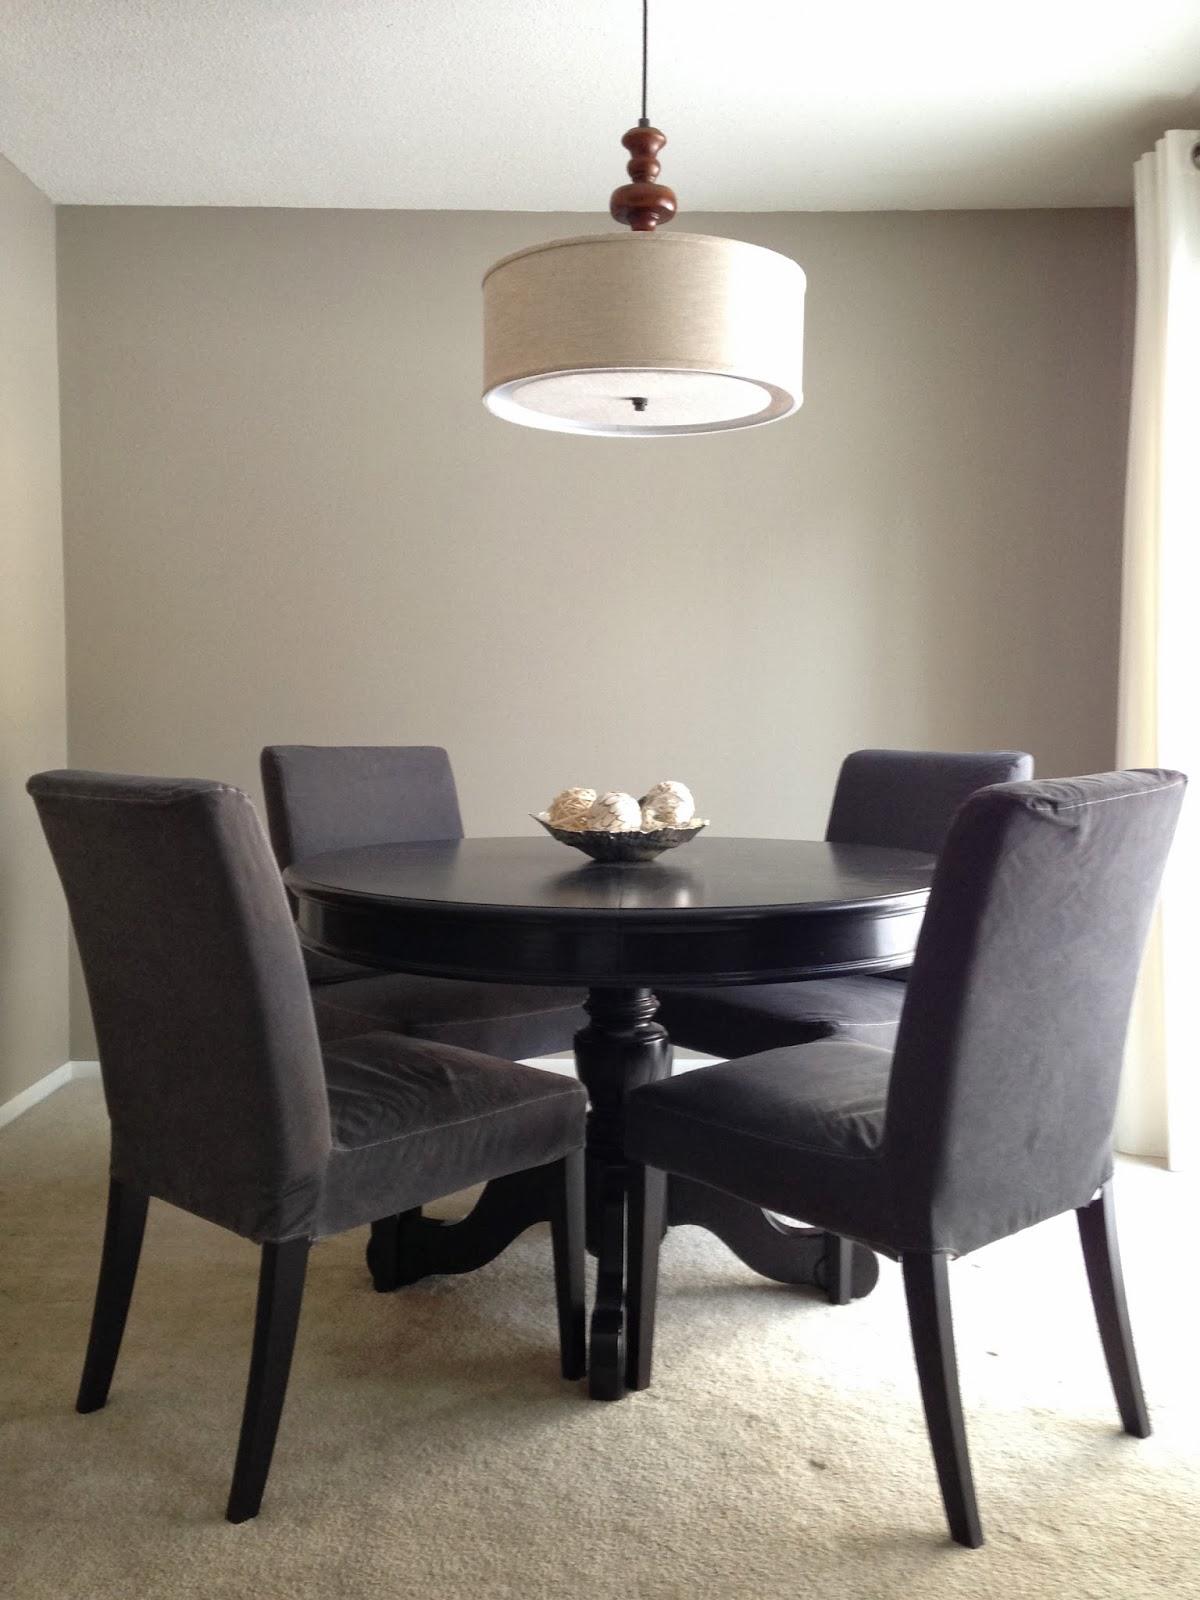 Marvelous 104Ferry New Chairs Dyed Slipcovers Creativecarmelina Interior Chair Design Creativecarmelinacom